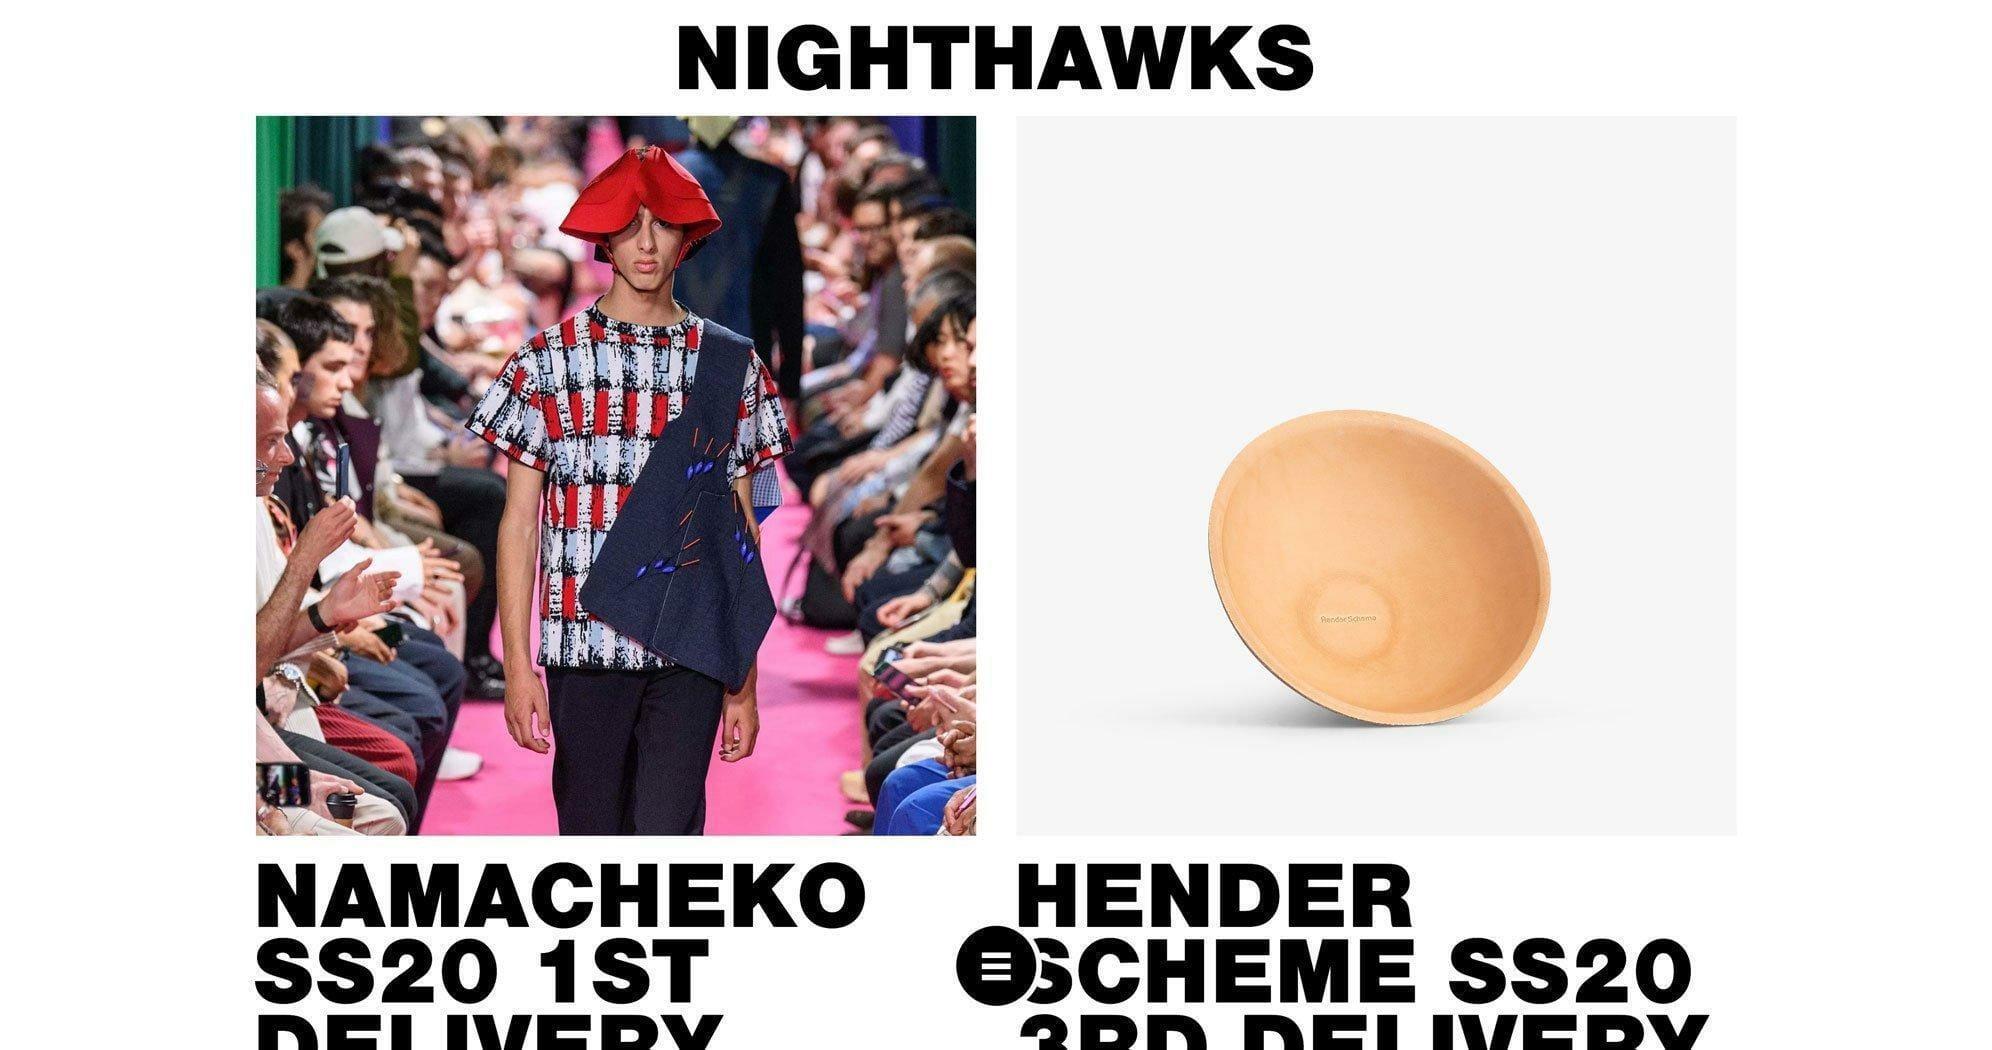 dazze-nighthawks-idea-002